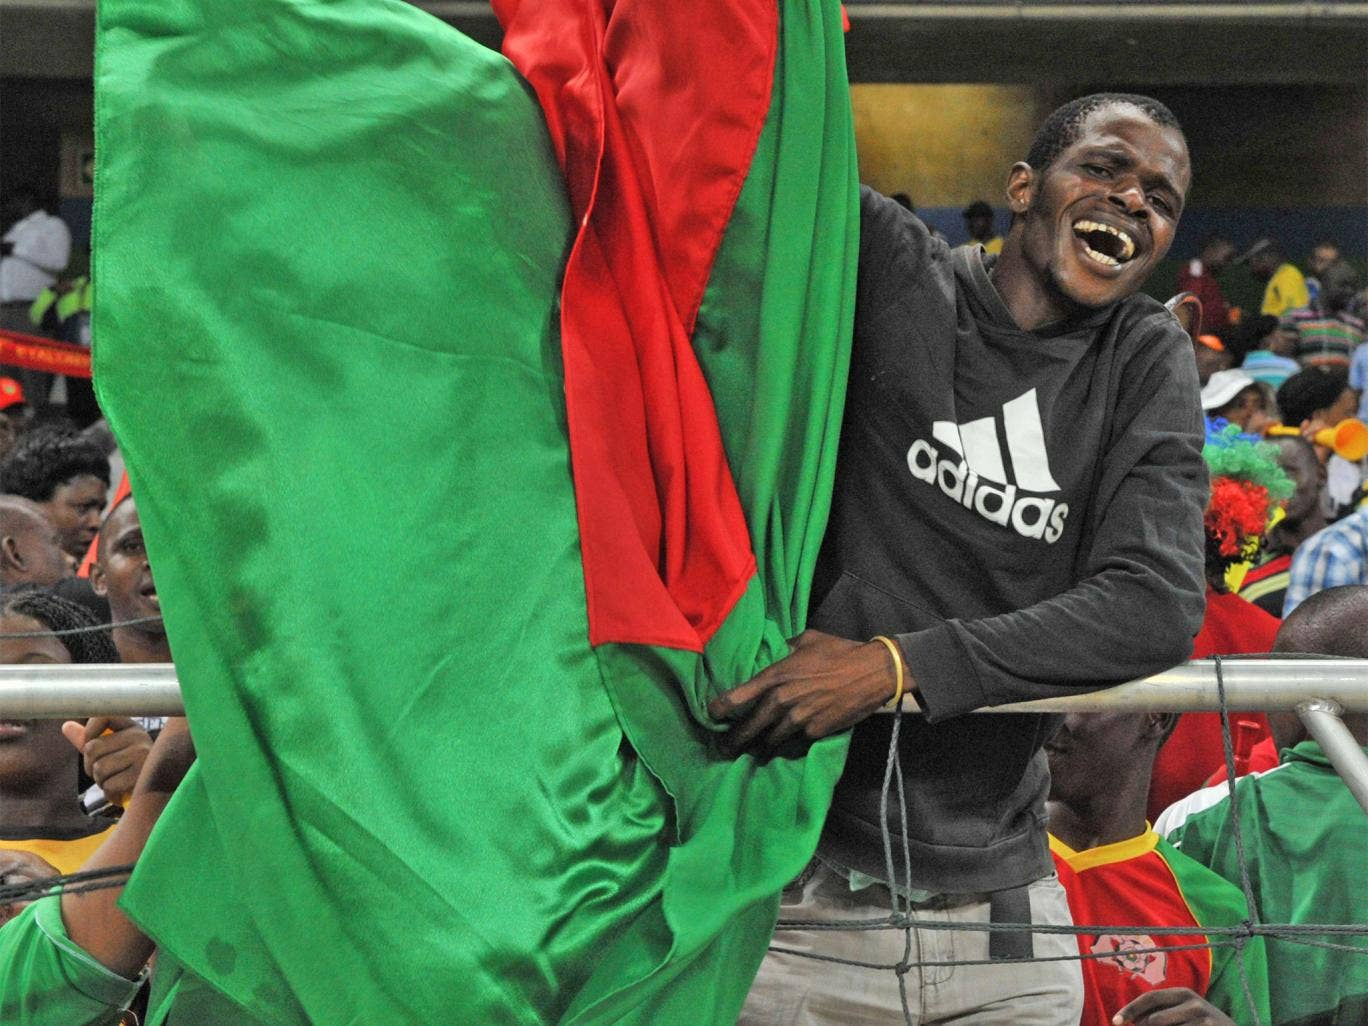 A Burkina-Faso supporter celebrates following their shootout victory